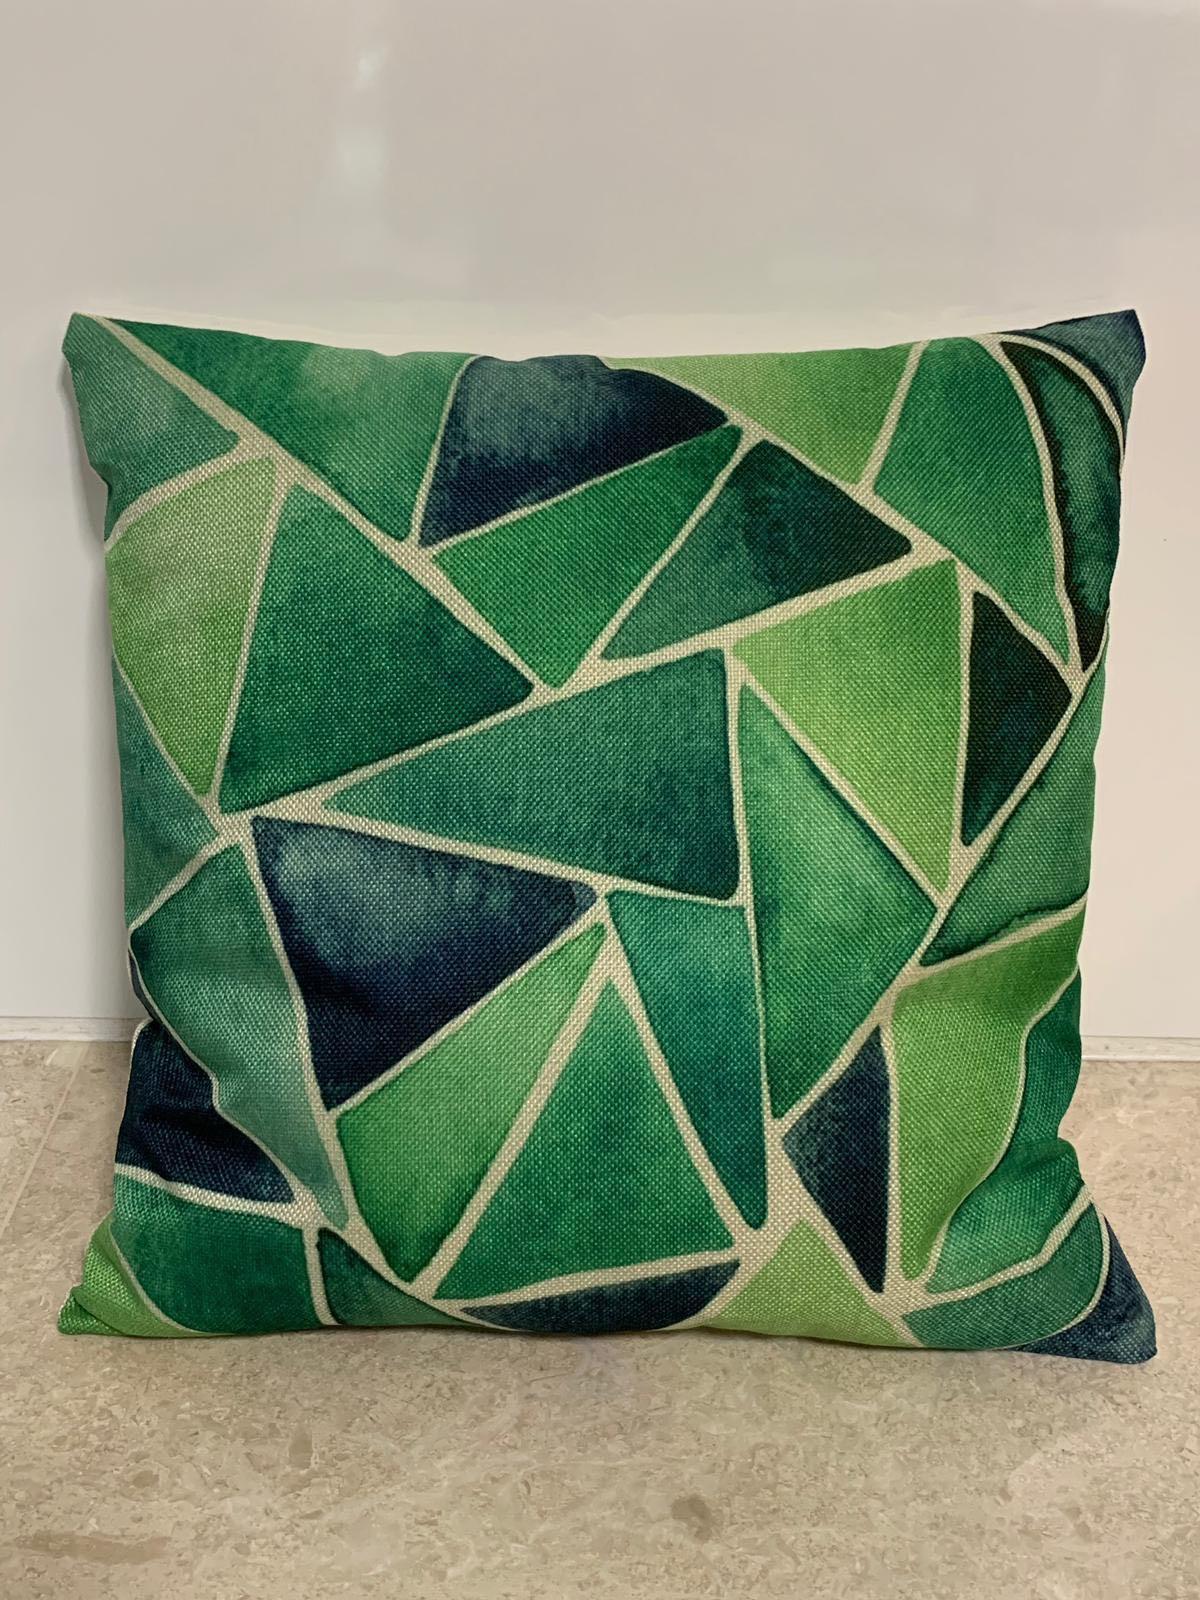 Linen Sofa Graphic Cushion Cover (SDJ-003)